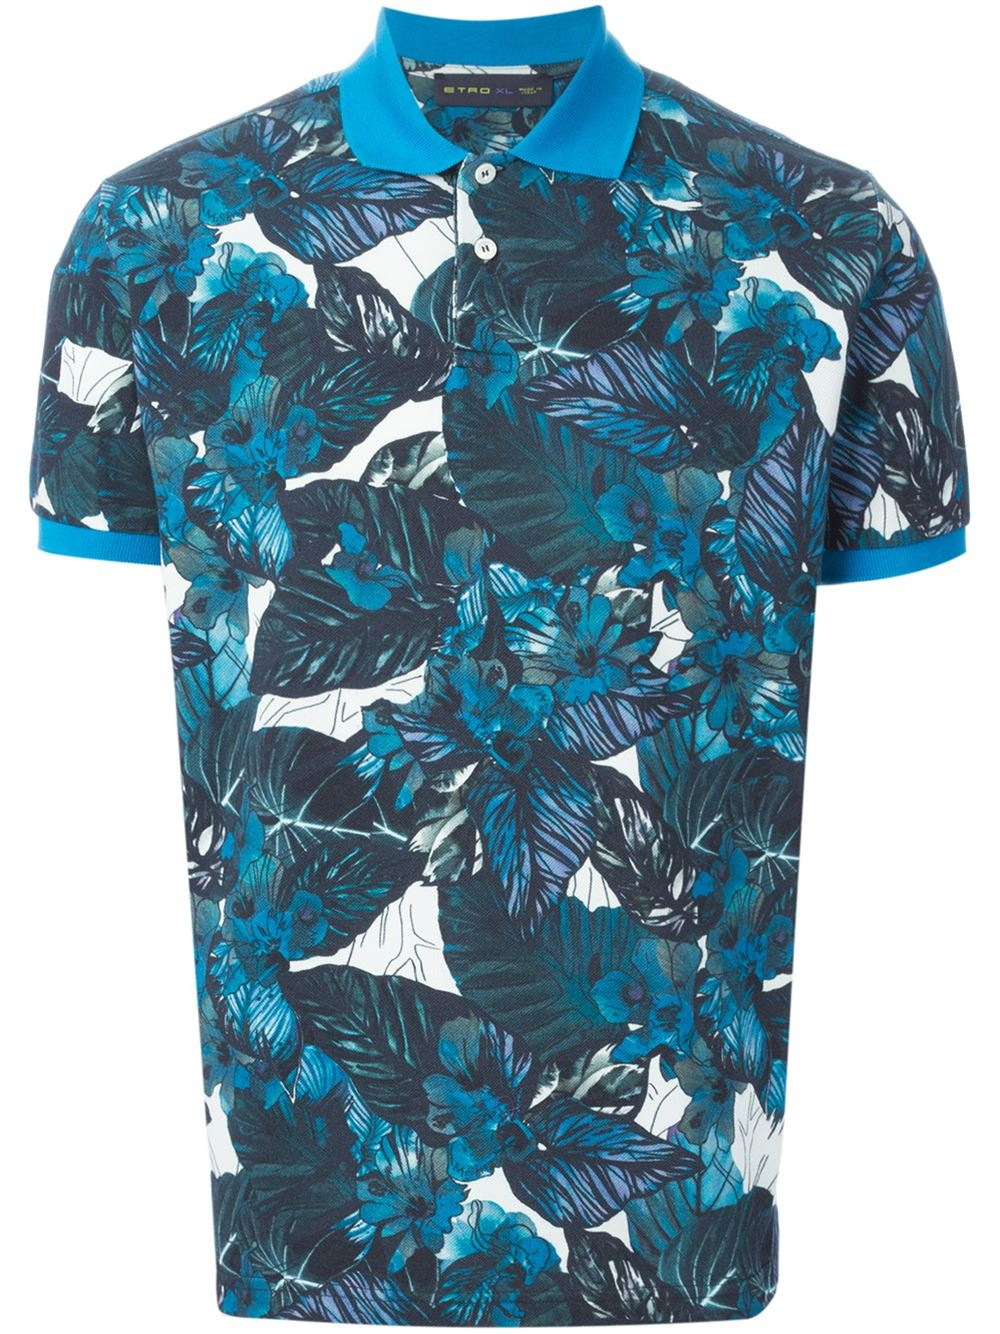 Polo Ralph Lauren Womens Polo Shirts